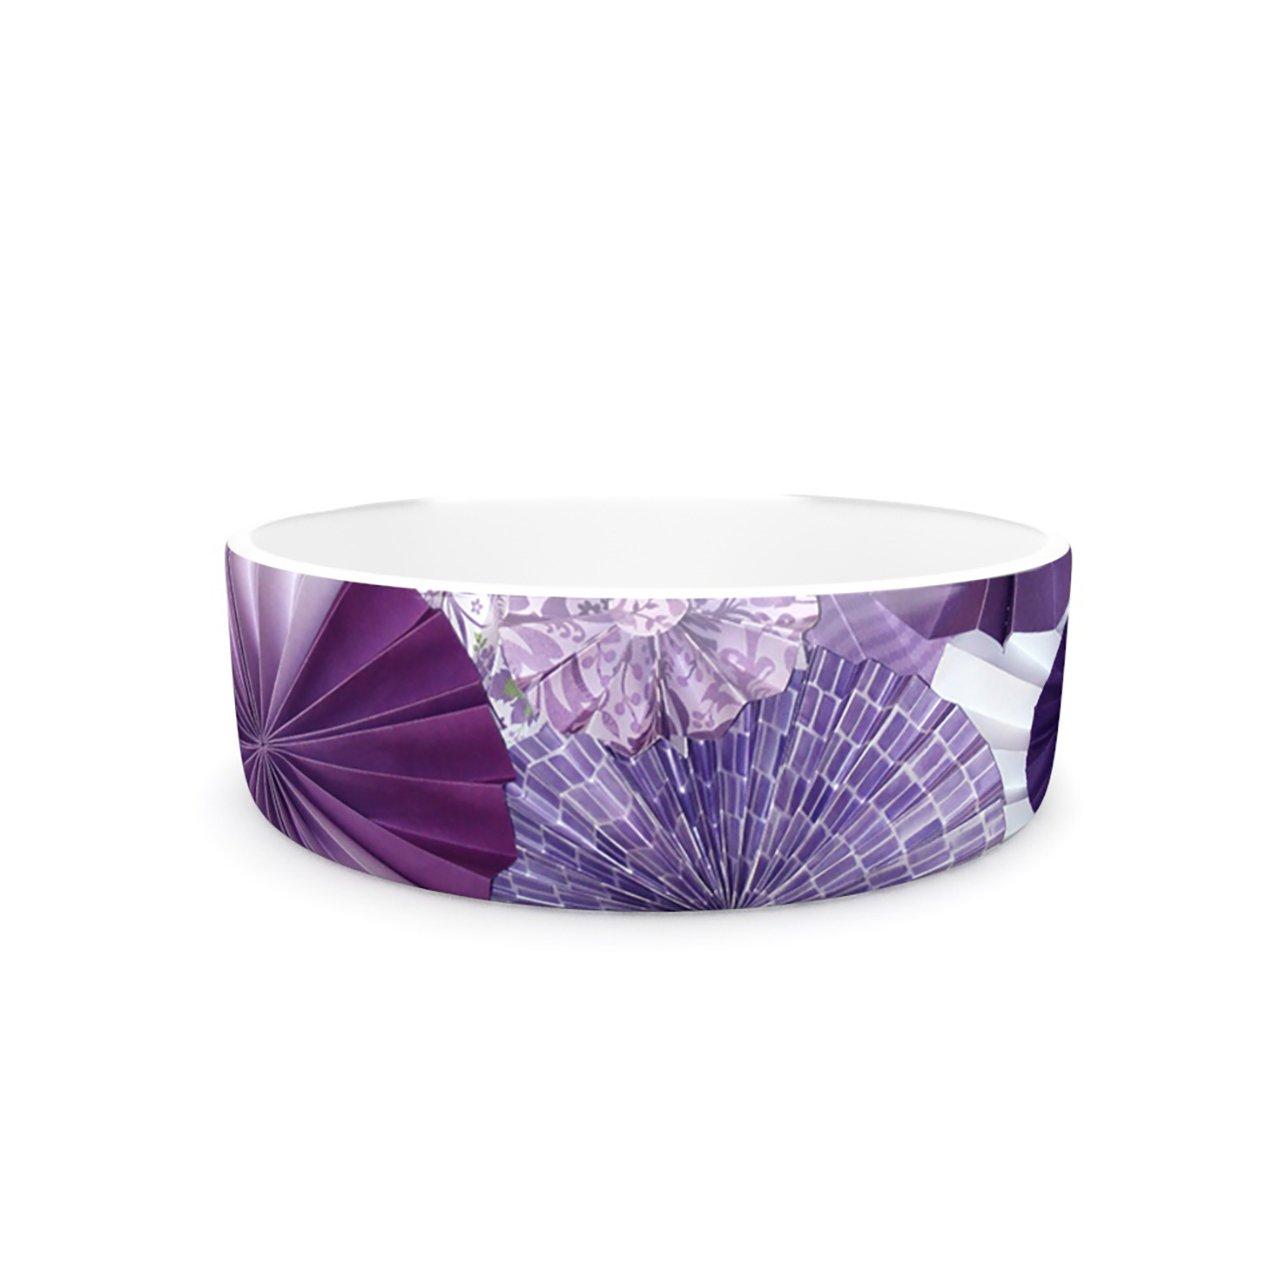 Kess InHouse Heidi Jennings Lavender Wishes  Pet Bowl, 7-Inch, Purple